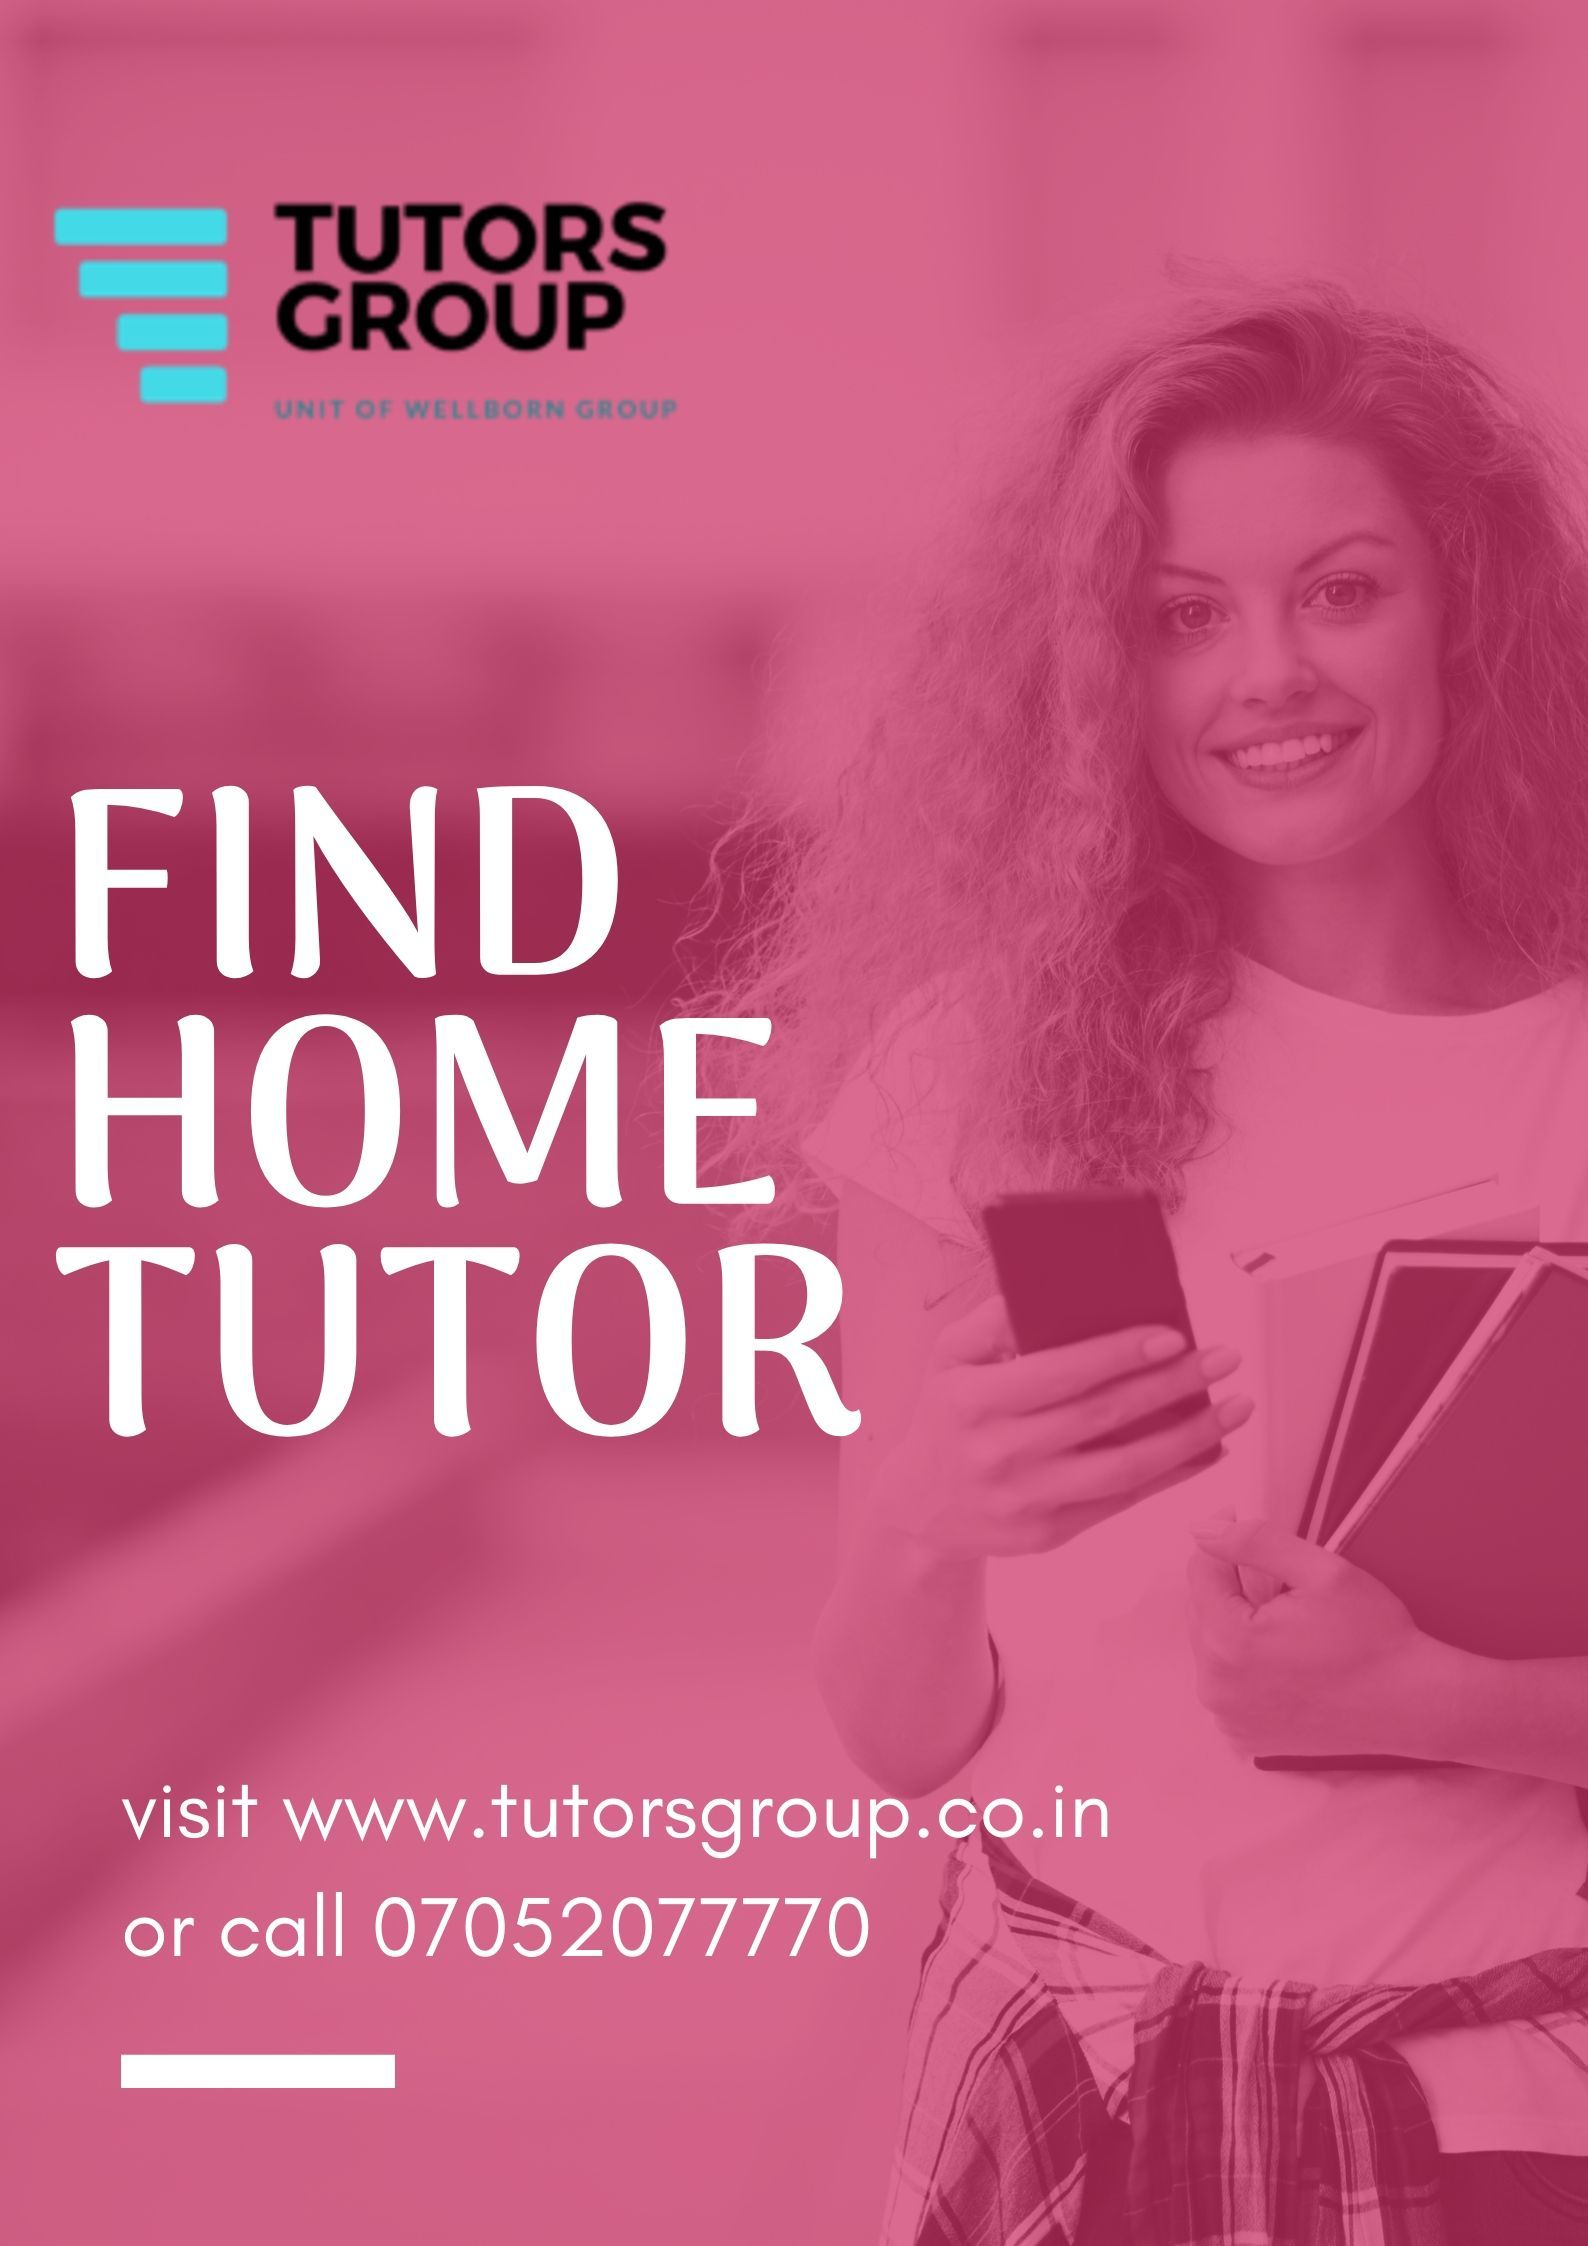 Get the best home tutor home tutors tutor study smarter